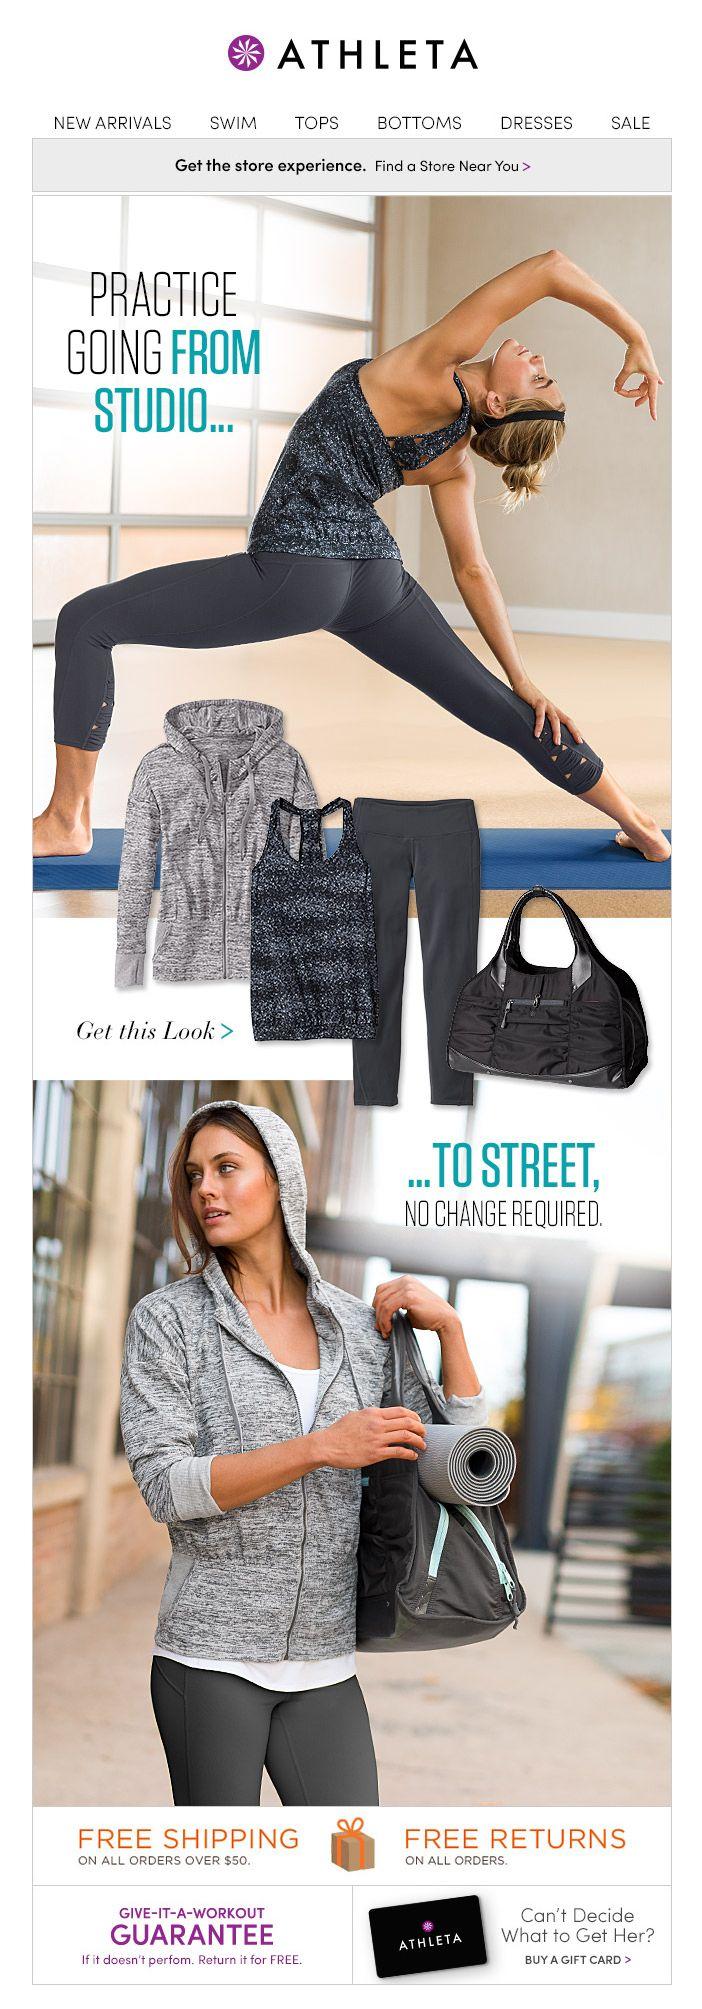 The Studio-to-Street Look | Awesome Screenshot